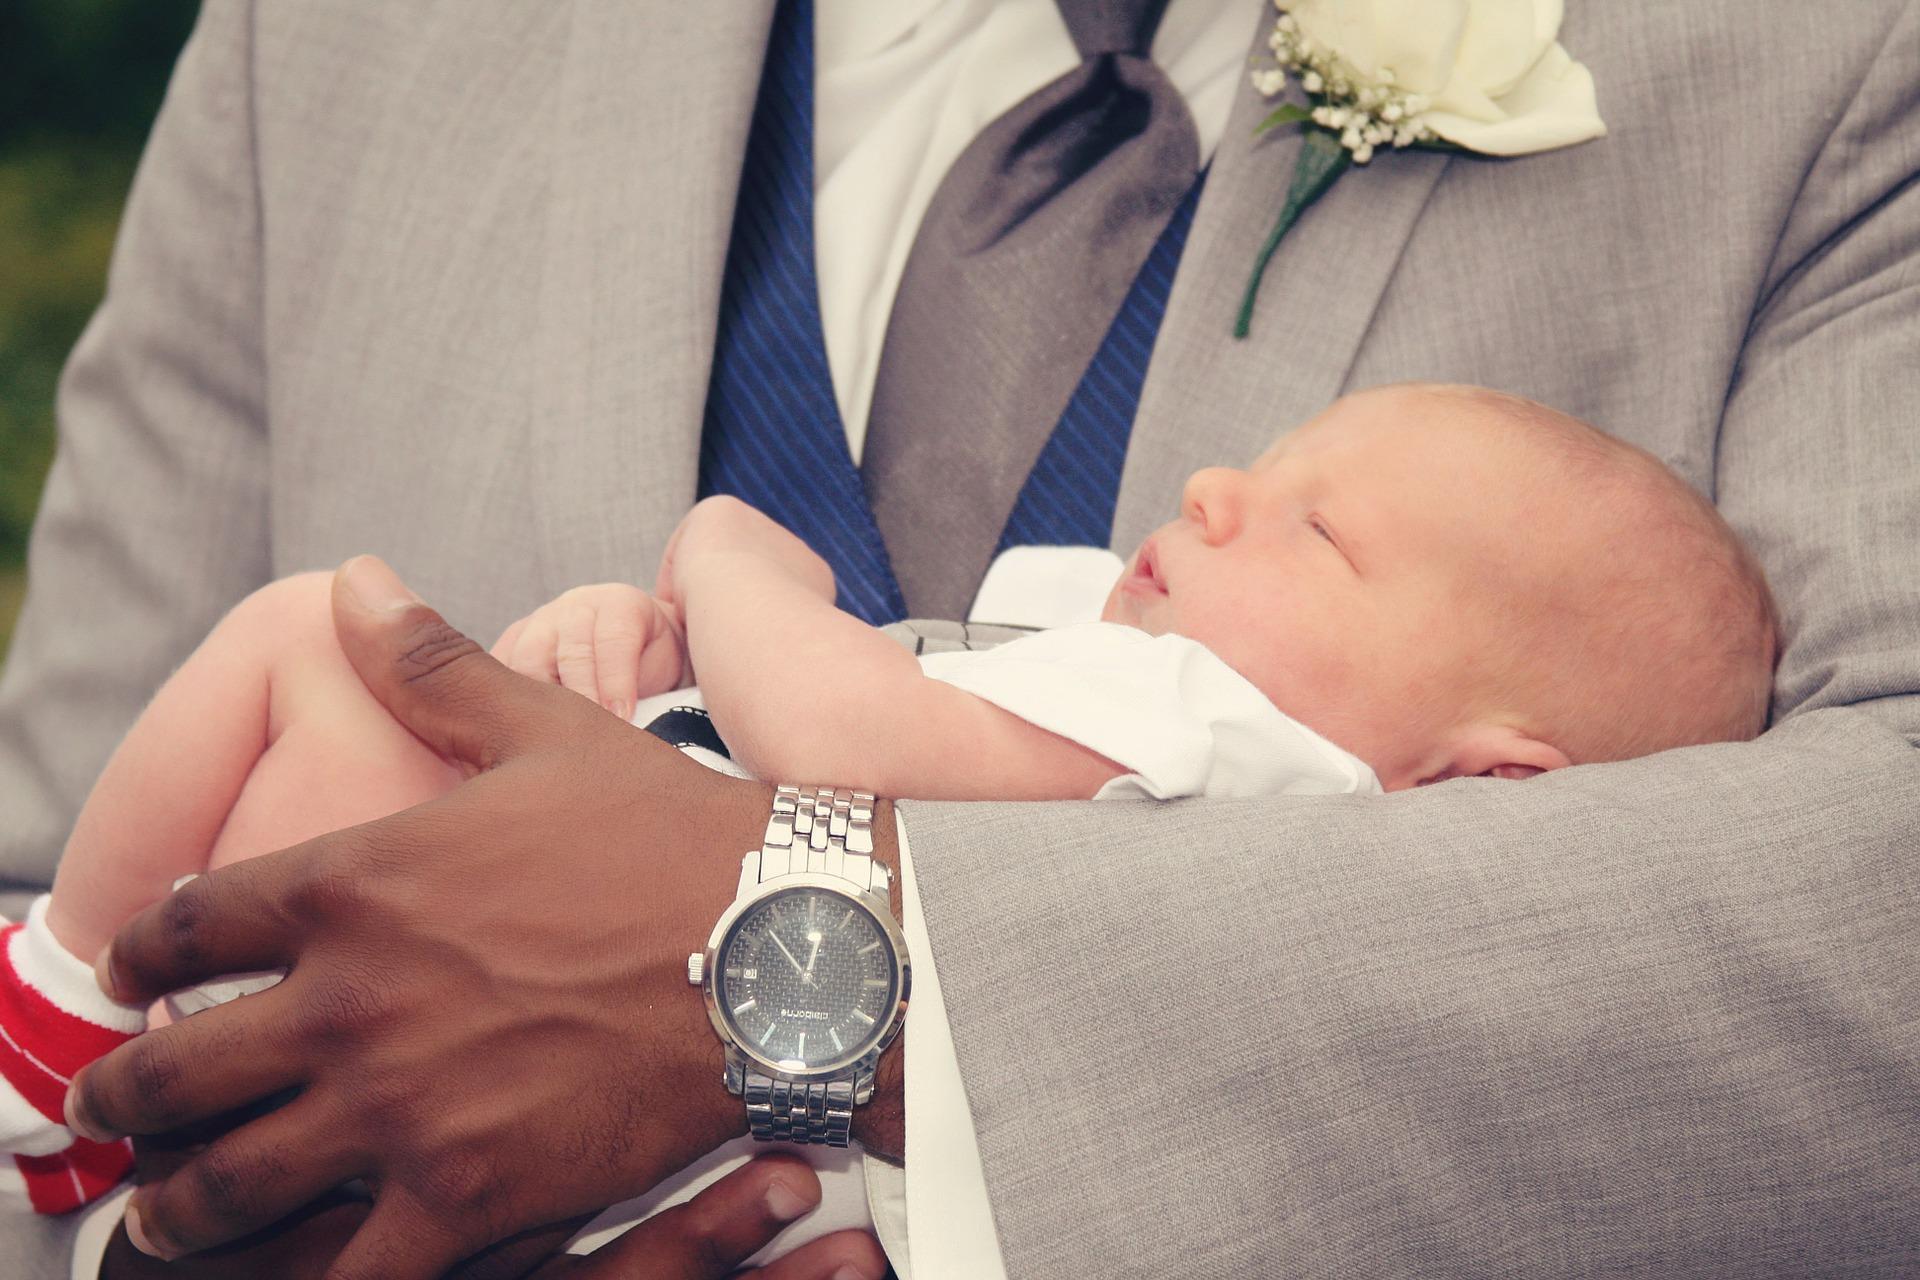 baptism-547222_1920.jpg